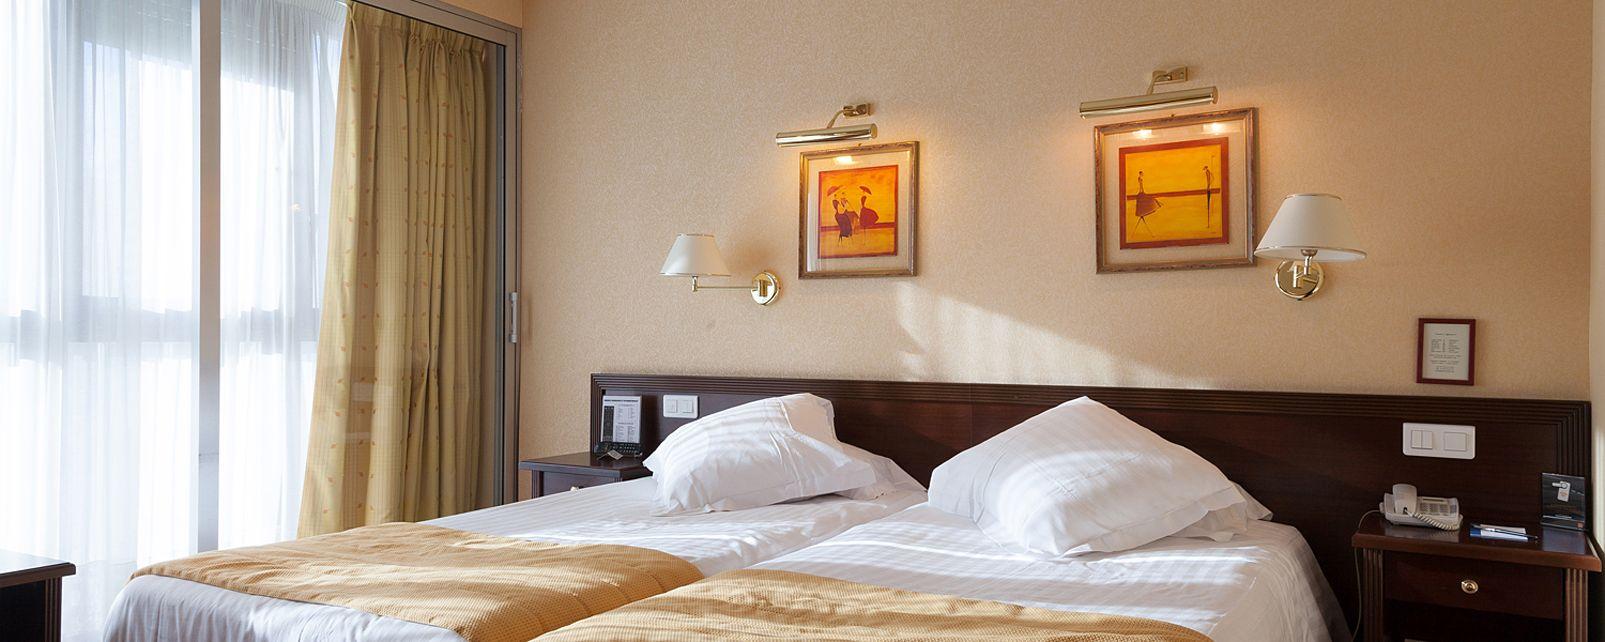 Hotel Splendid Hotel and Spa